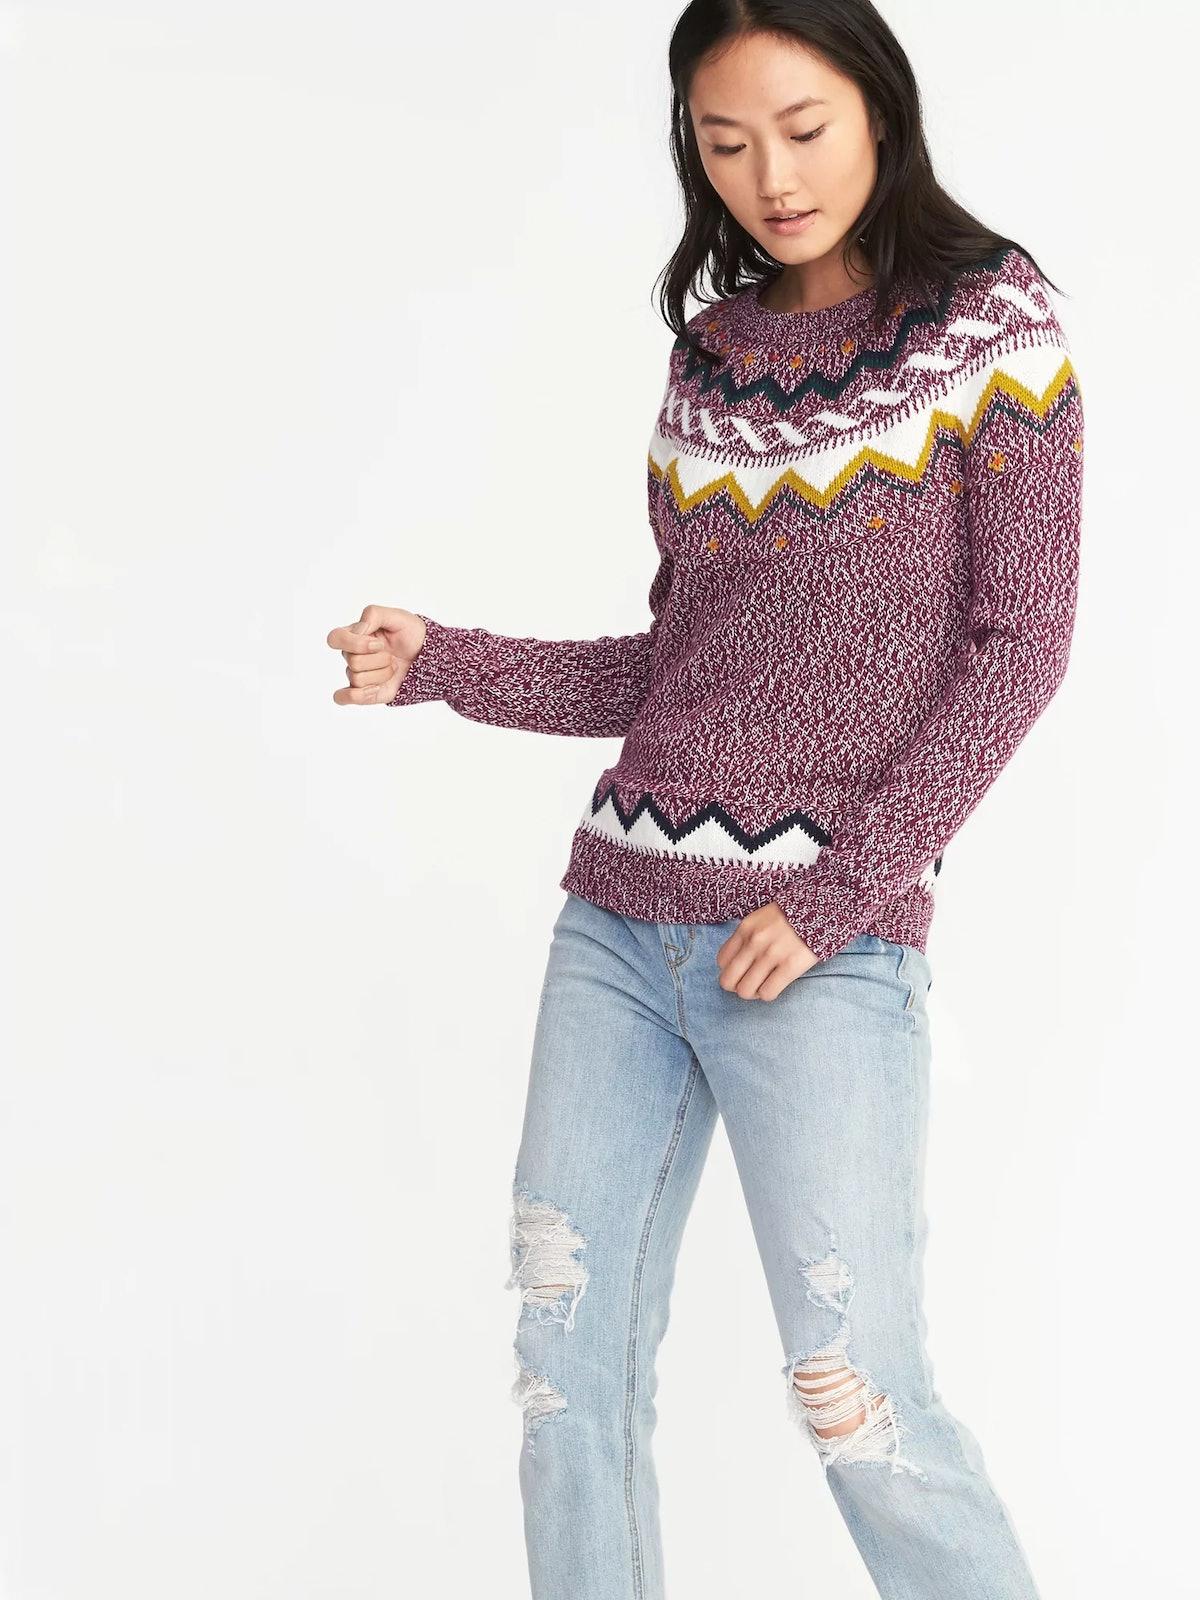 Classic Fair Isle Sweater for Women